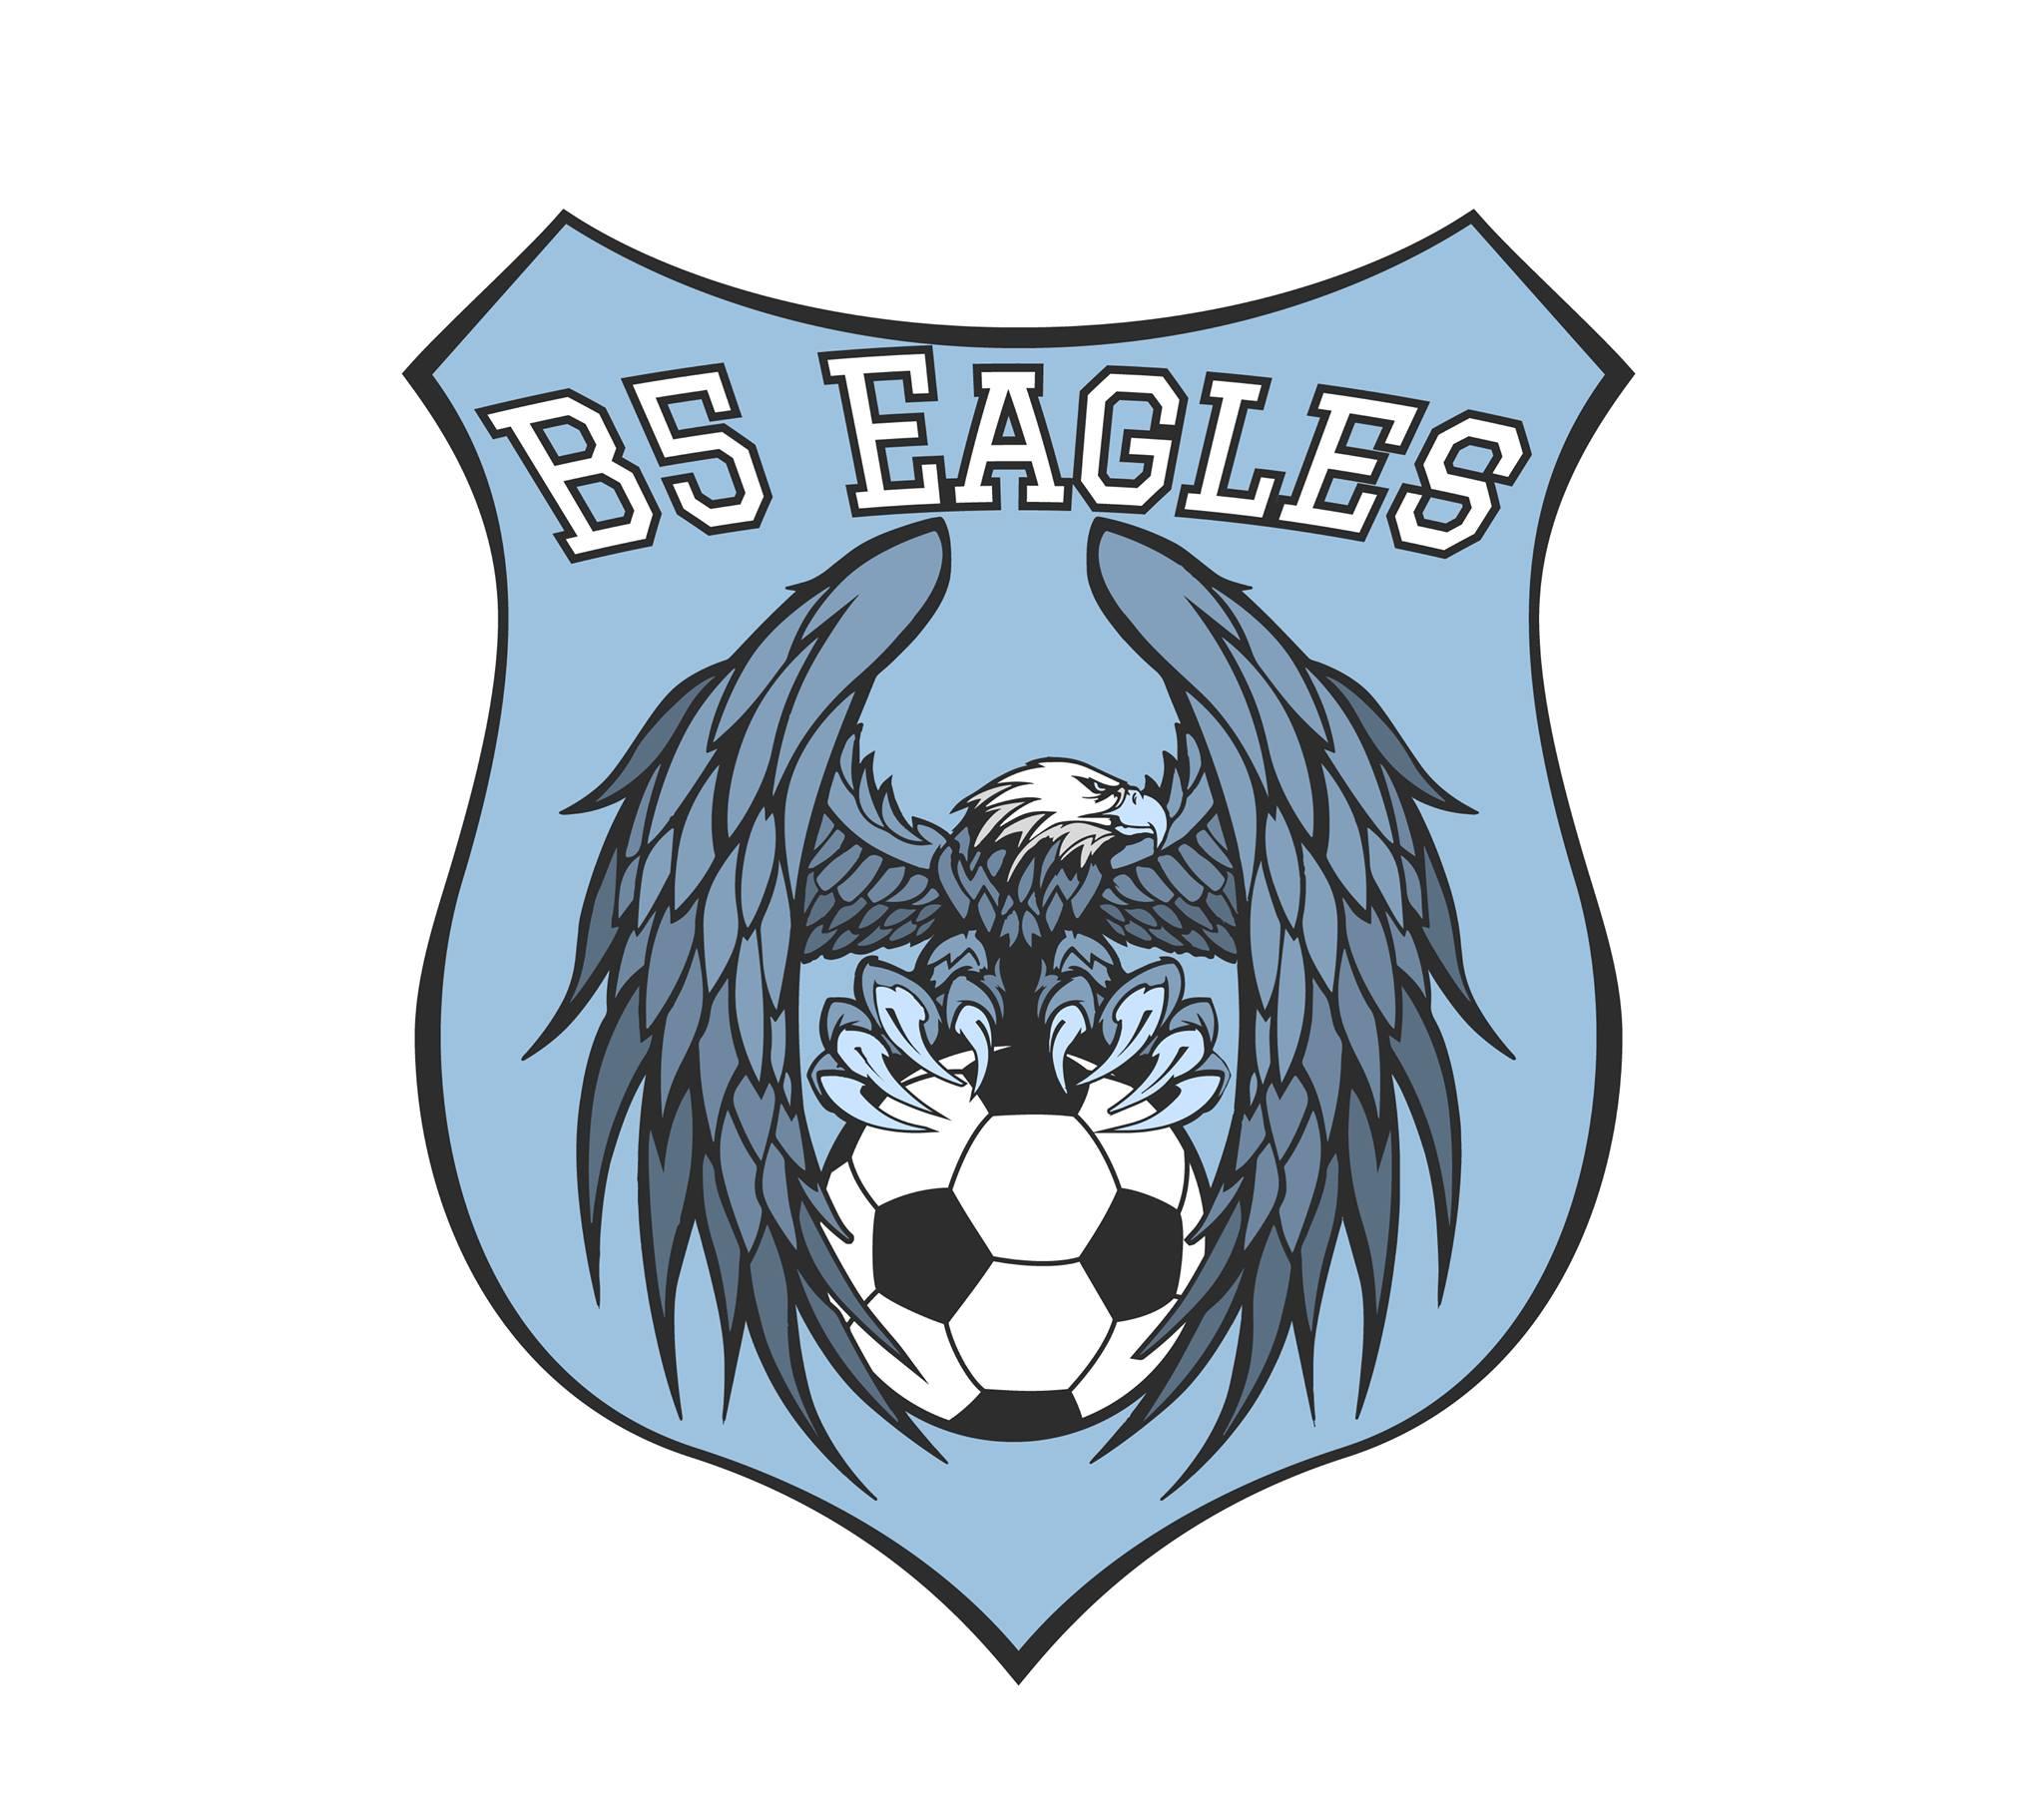 B5 Eagles